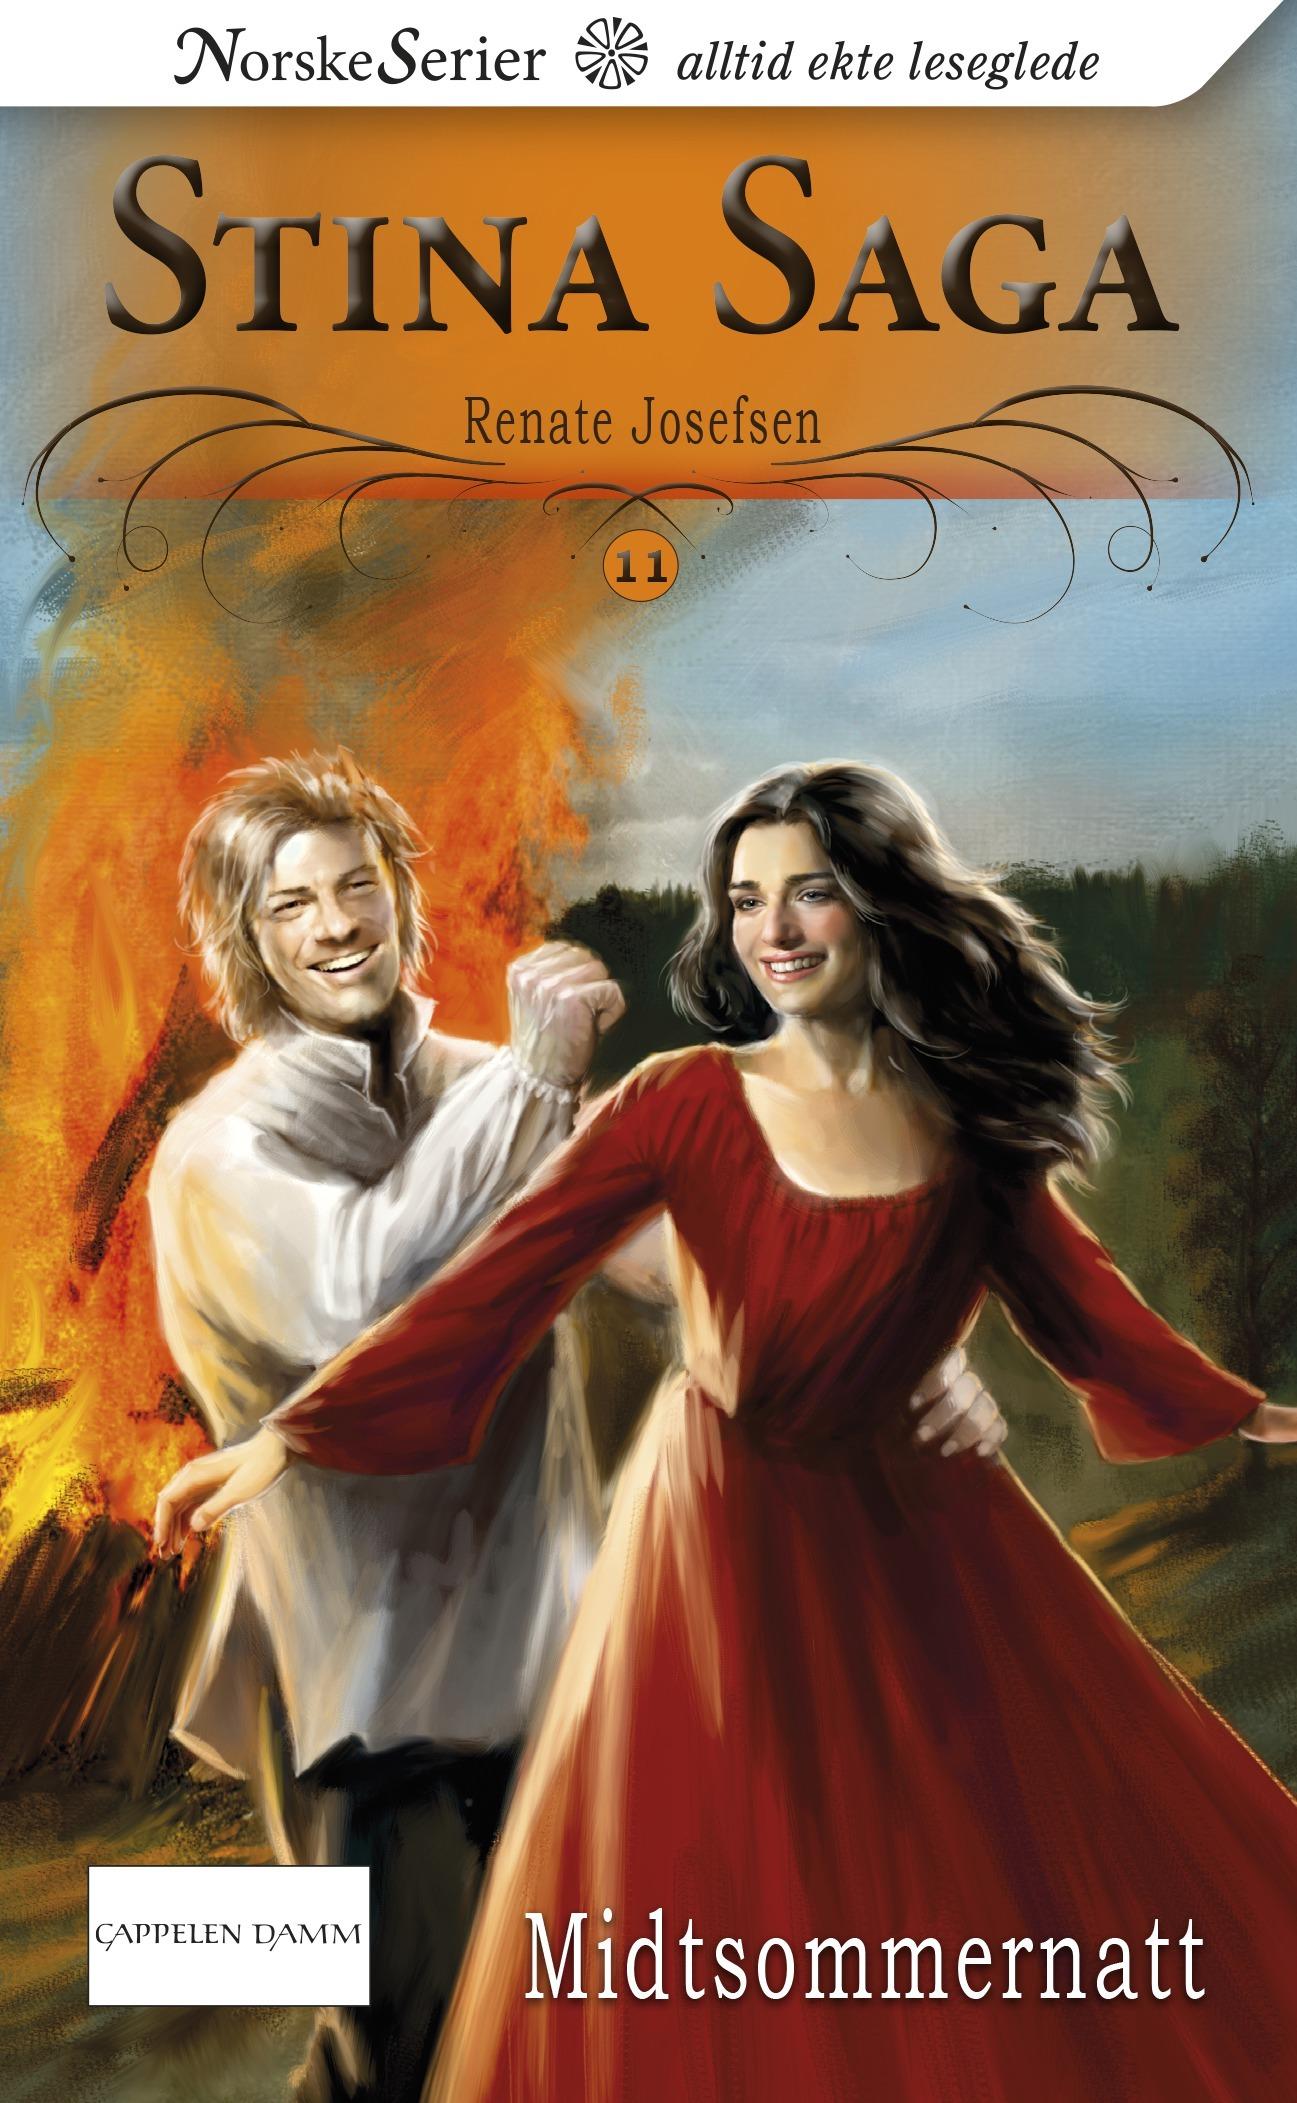 Midtsommernatt (Stina Saga #11)  by  Renate Josefsen